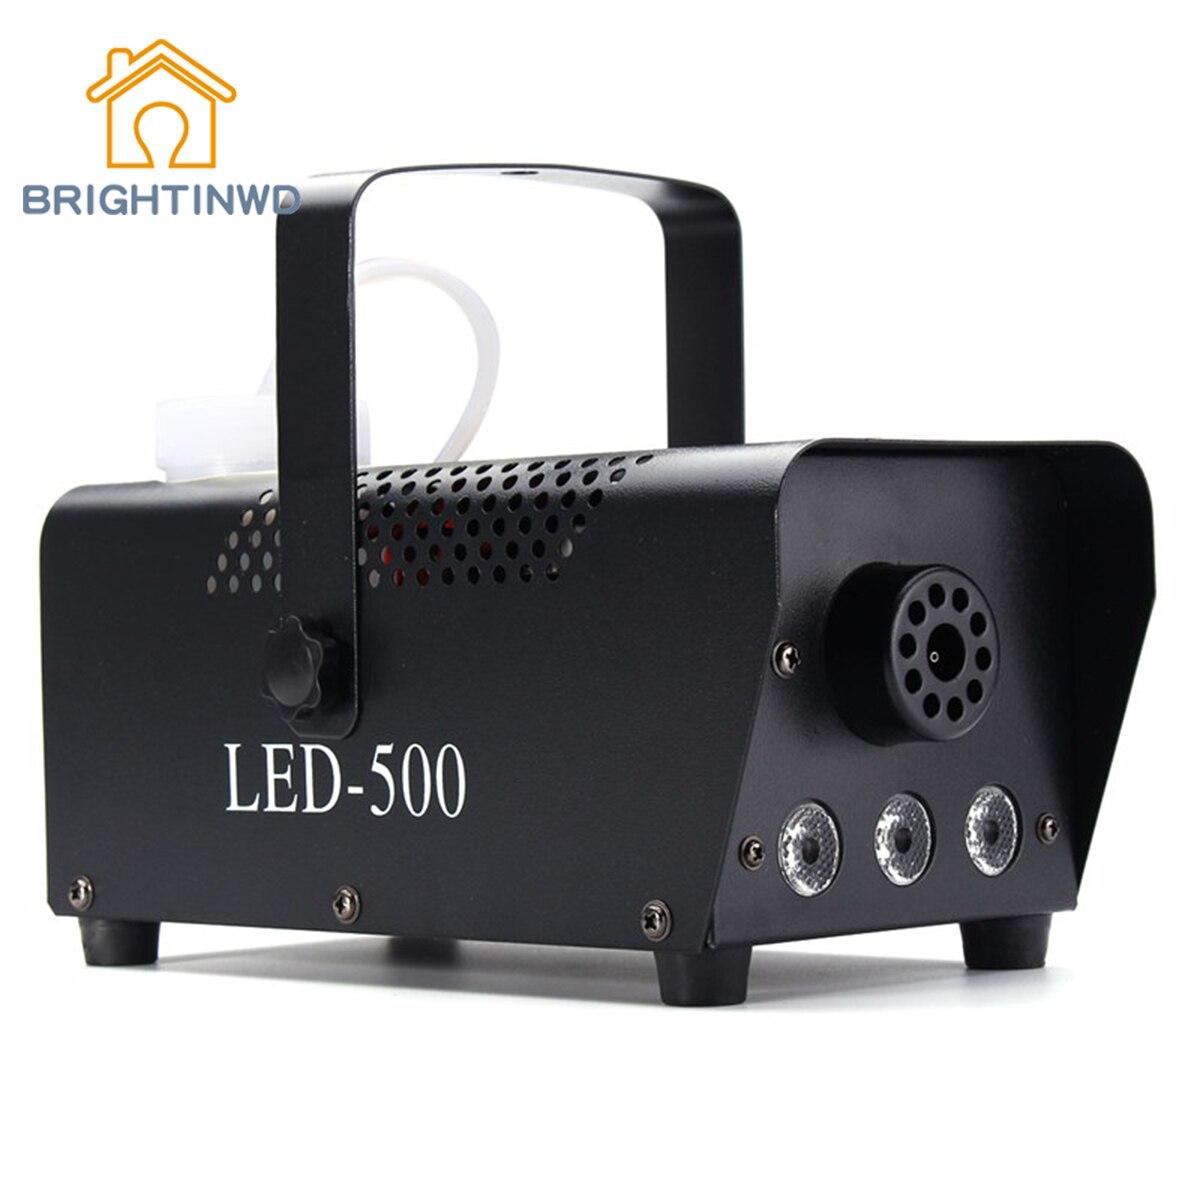 BRIGHTINWD Effect For DJ Disco Party Club Fogger with Remote 110V-230V RGB LED Wireless Smoke Fog Machine 500W Stage Lighting